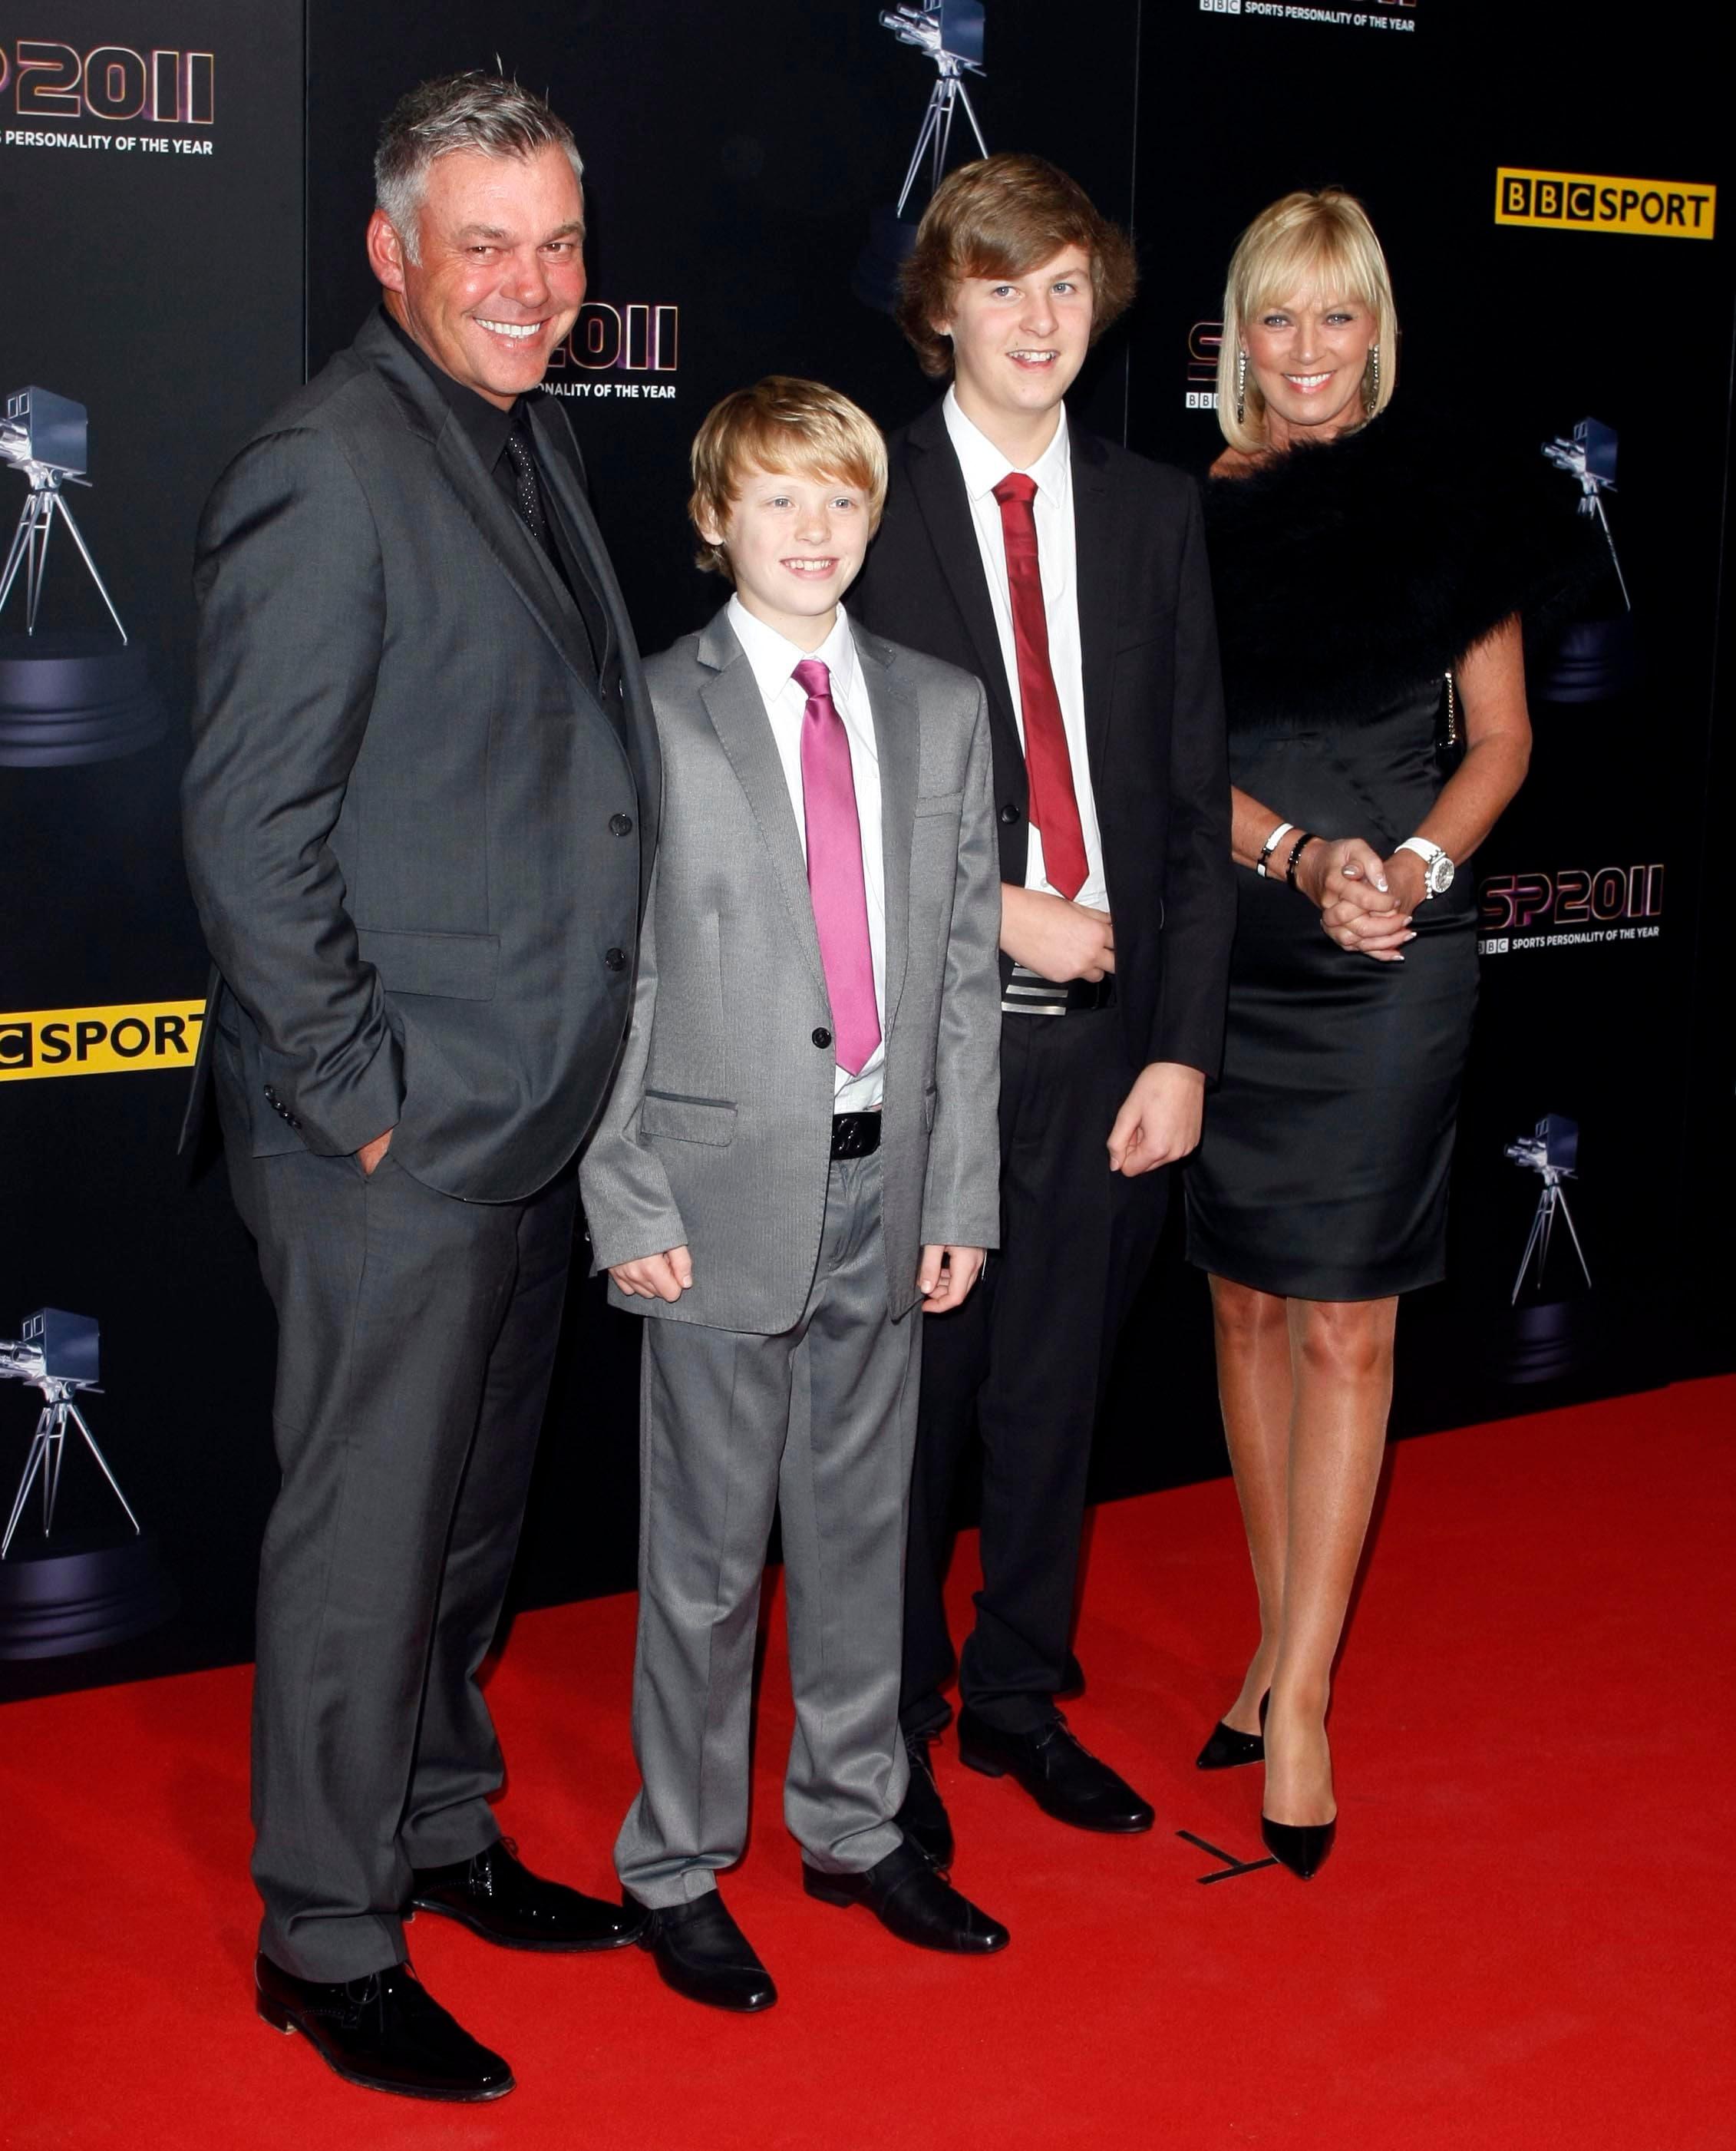 Darren Clarke with sons in 2011